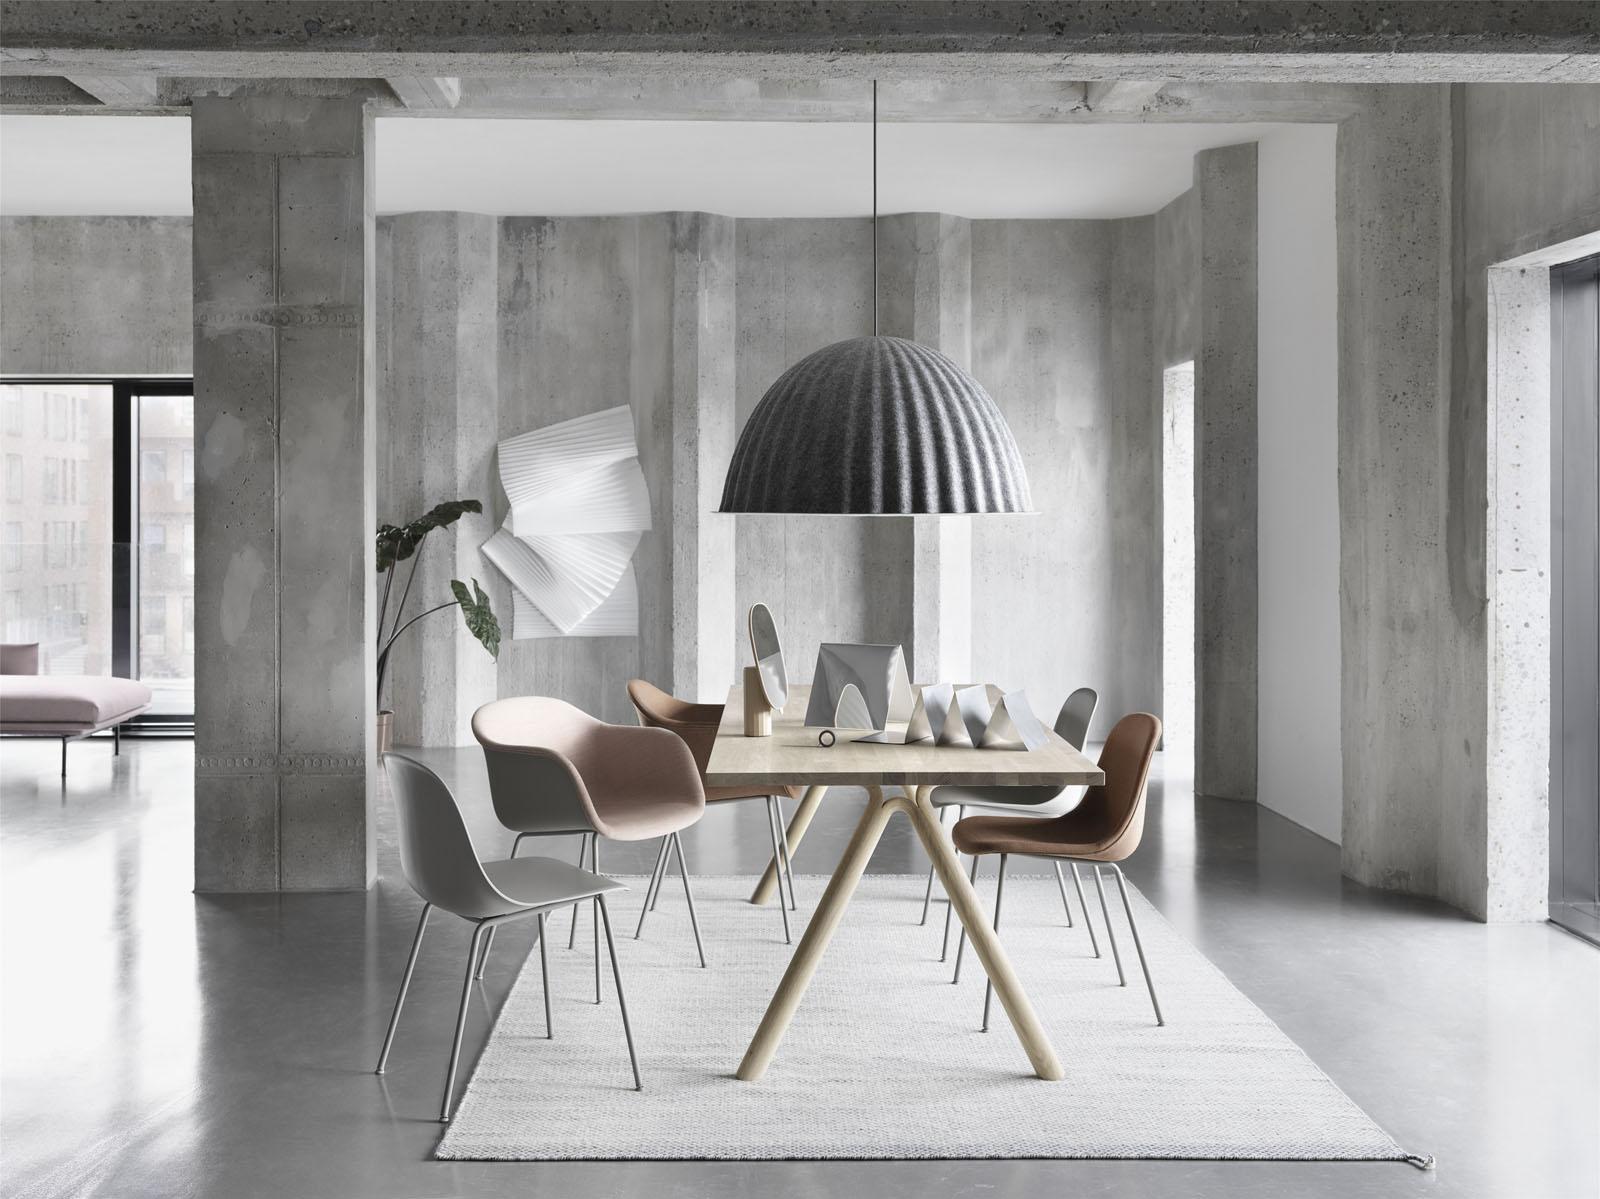 Split-Table-Fiber-Side-Armchair-tube-front-upholstery-Mimic-Under-The-Bell-wide-org.jpg